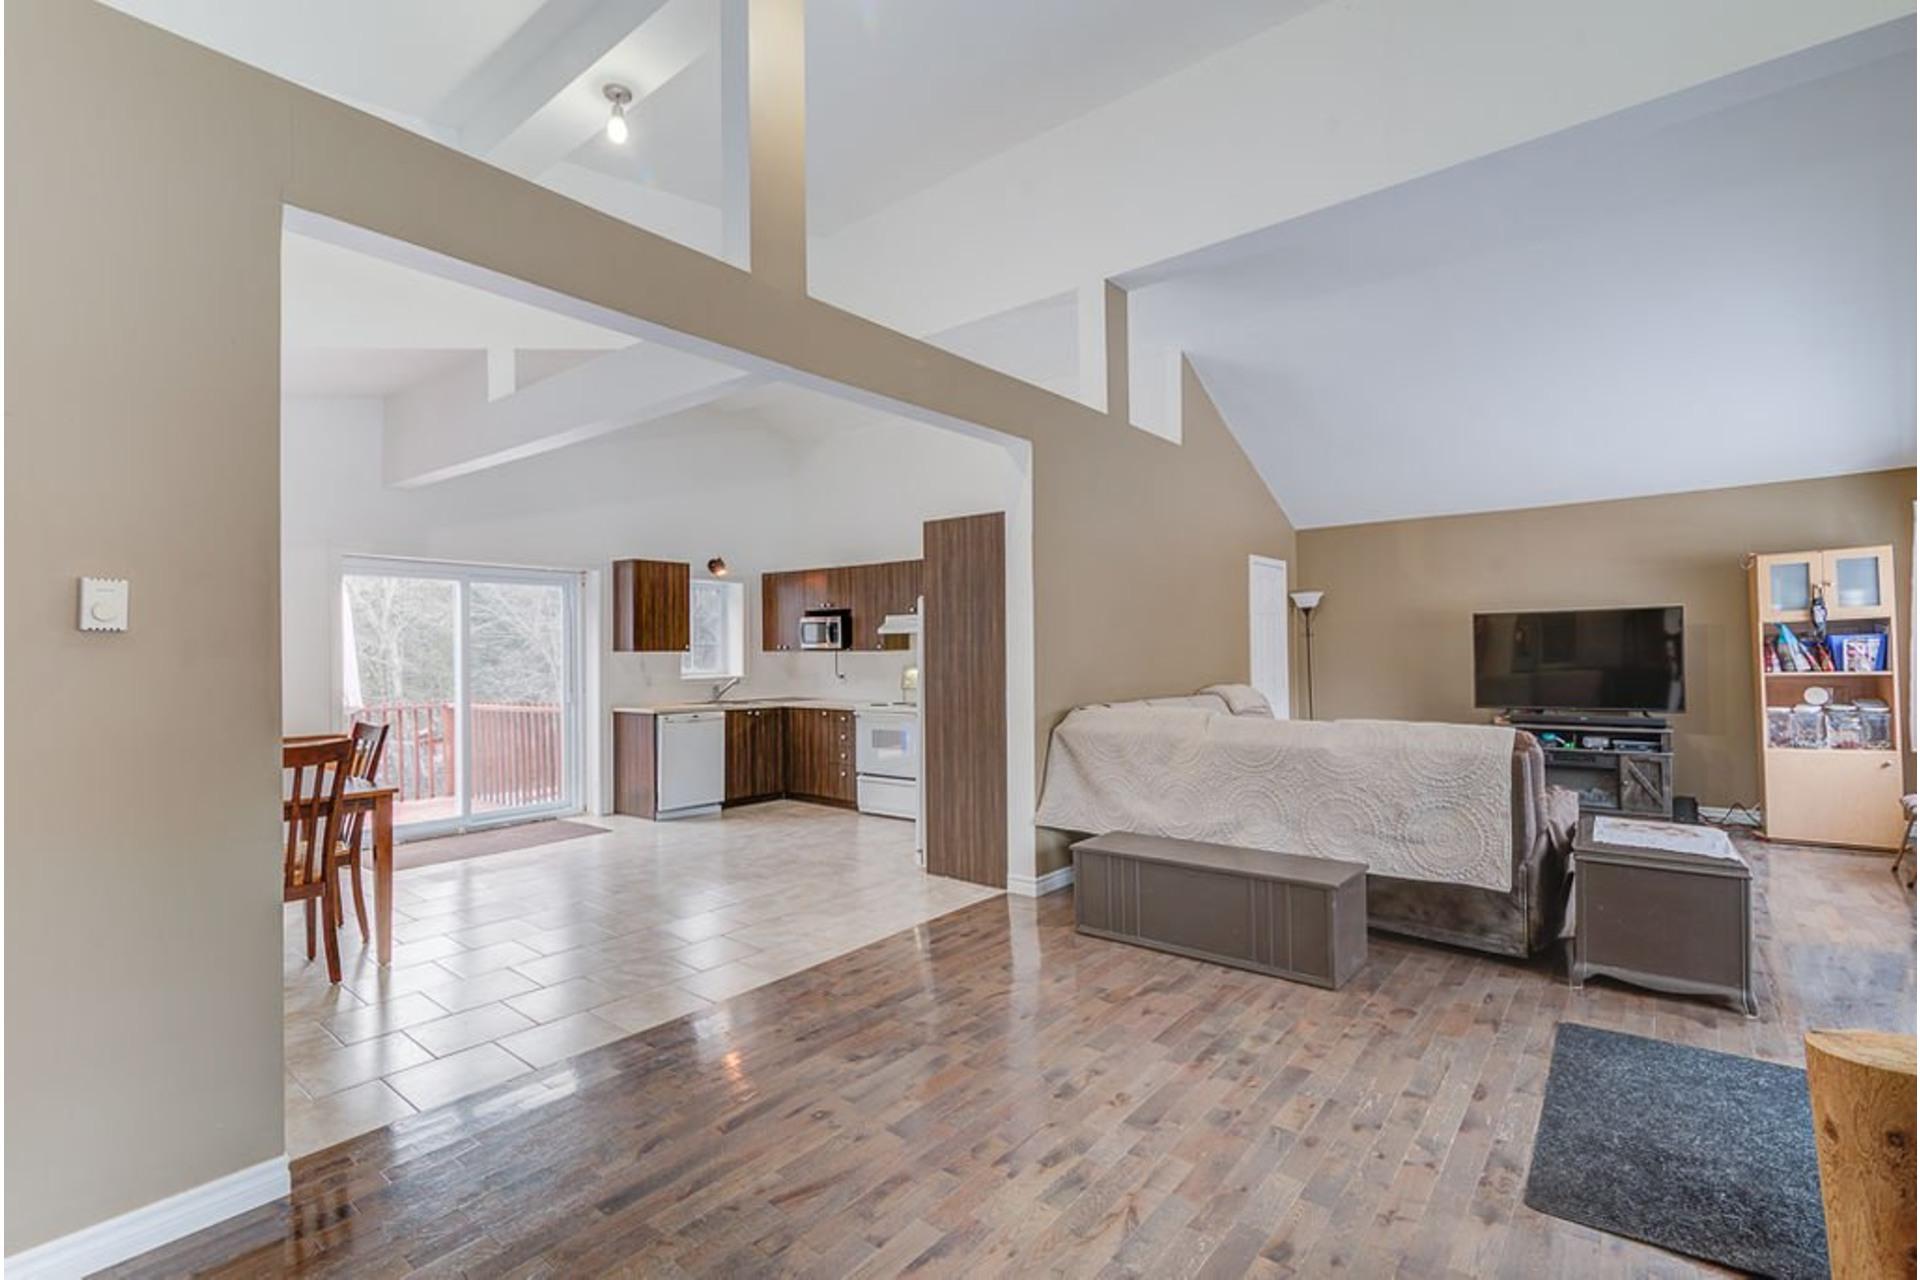 image 4 - House For sale Sainte-Julienne - 7 rooms